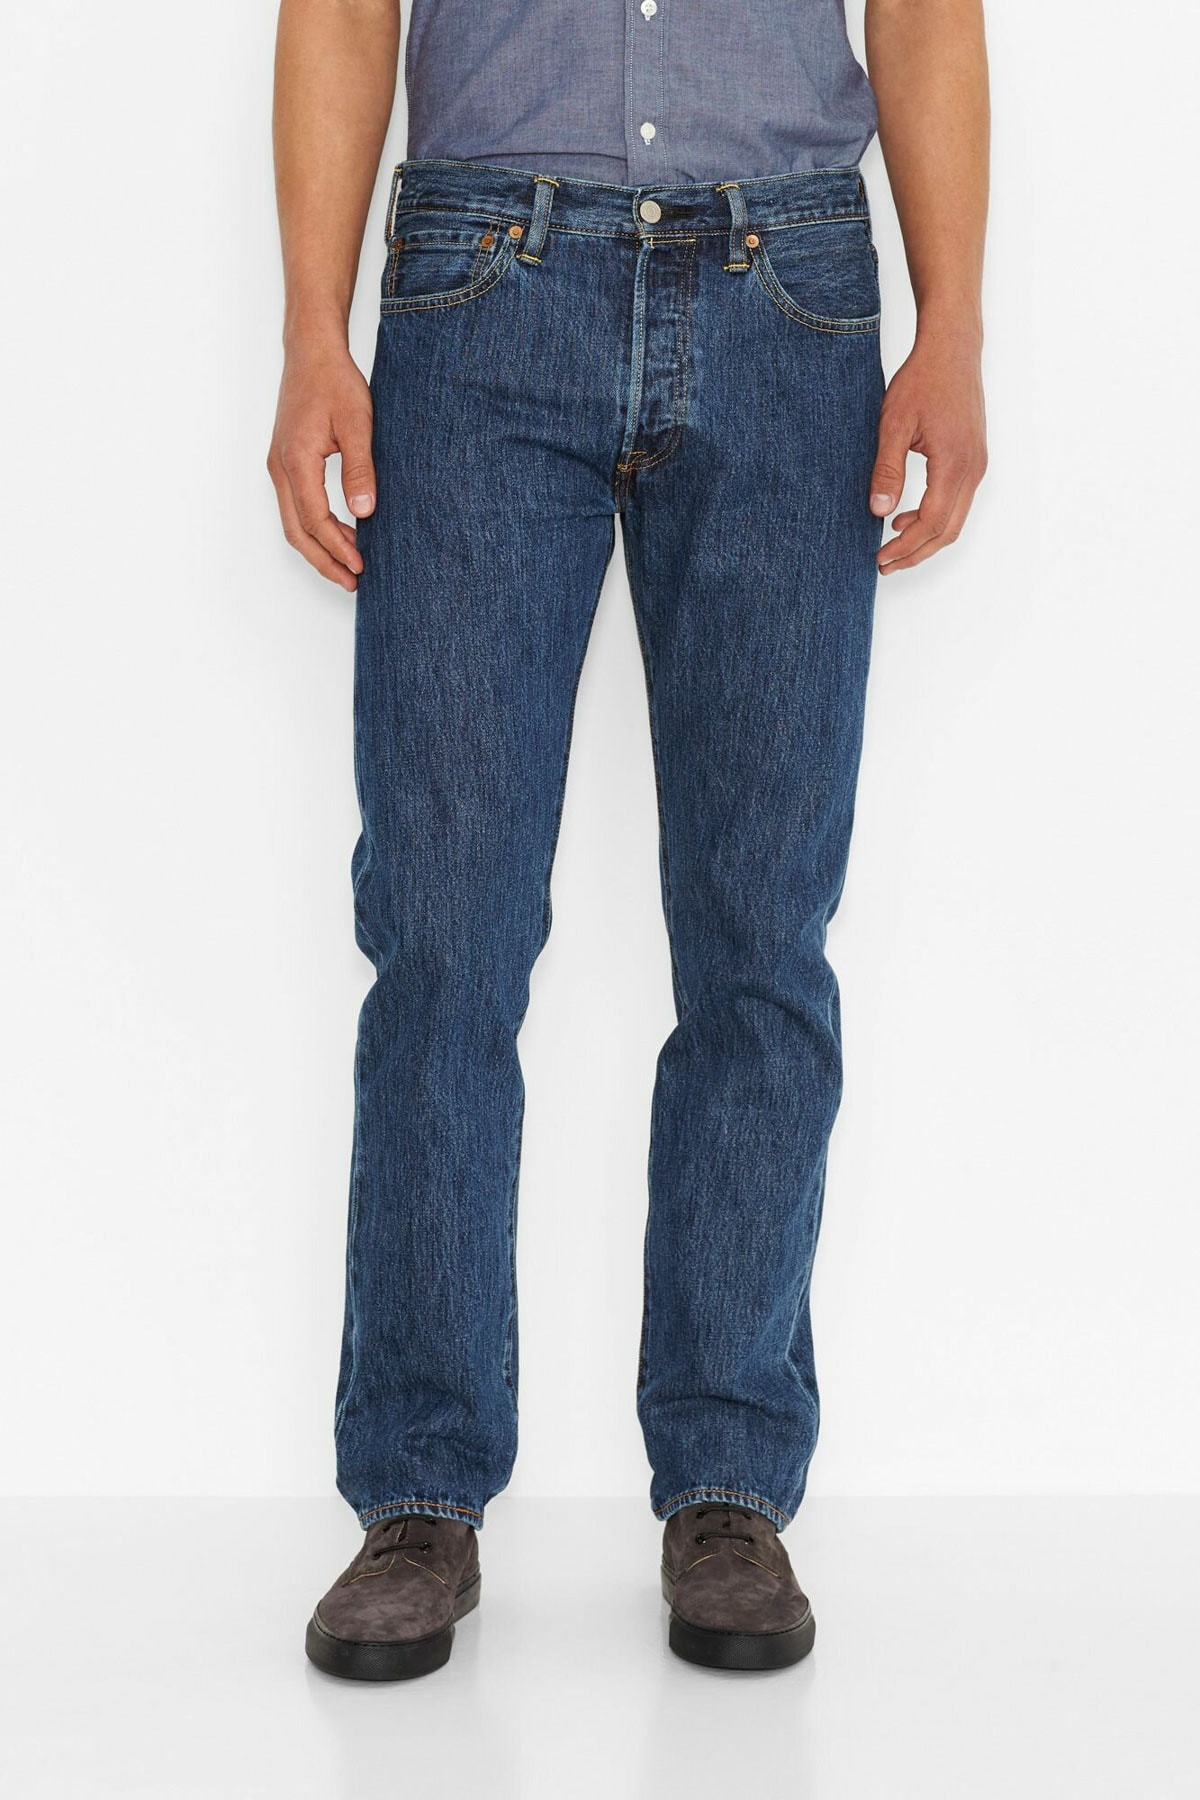 Levıs 501® Original Fit Erkek Kot Pantolon 00501-0114